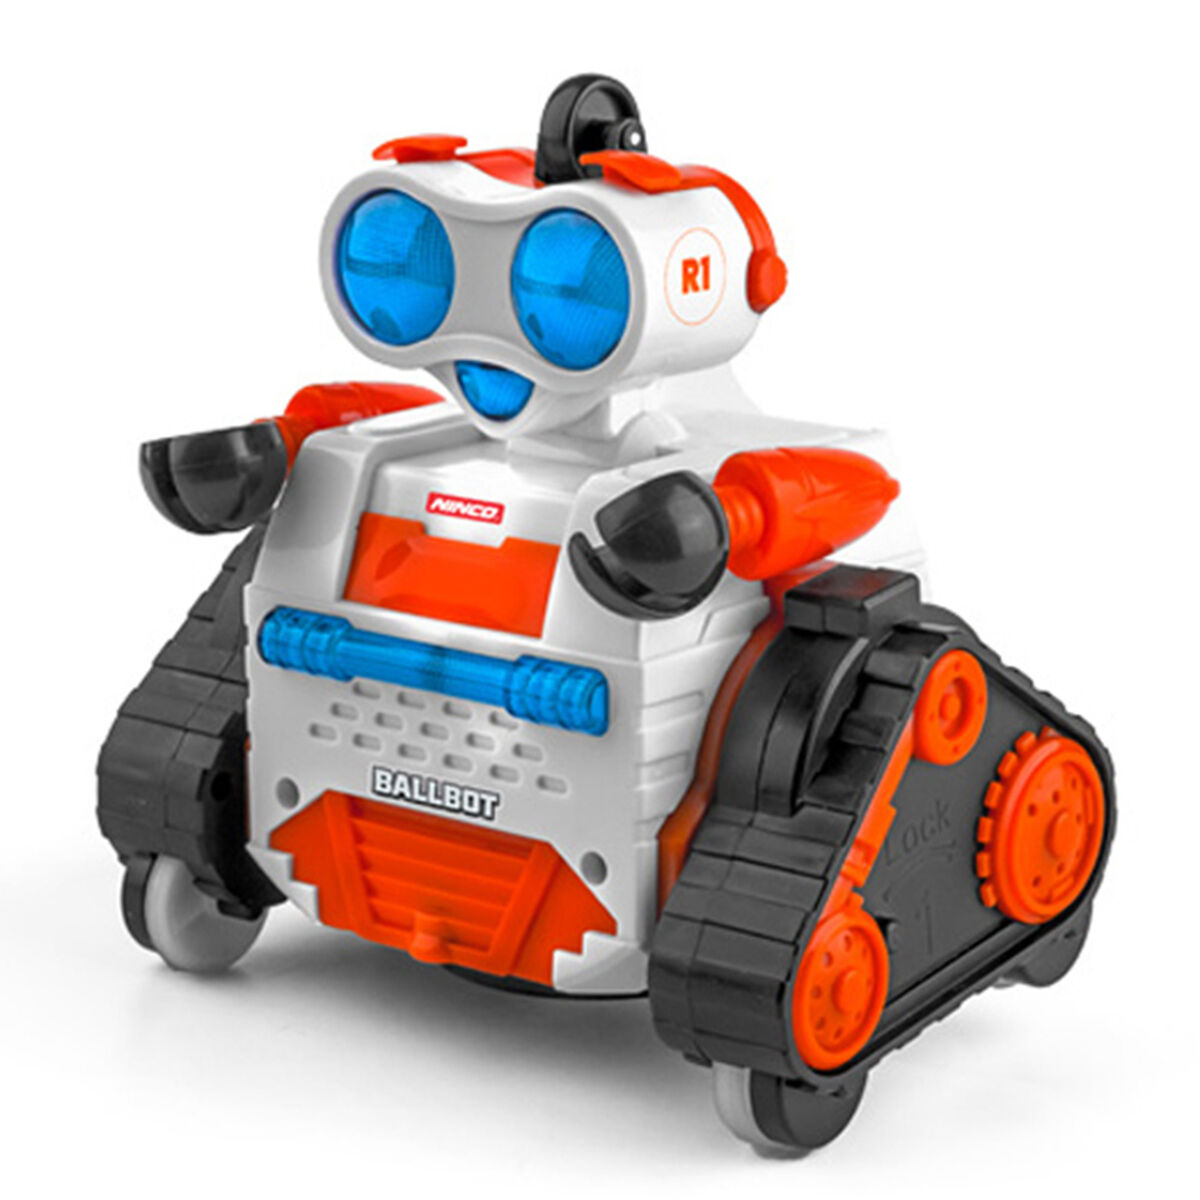 Robot Ninco Ballbot